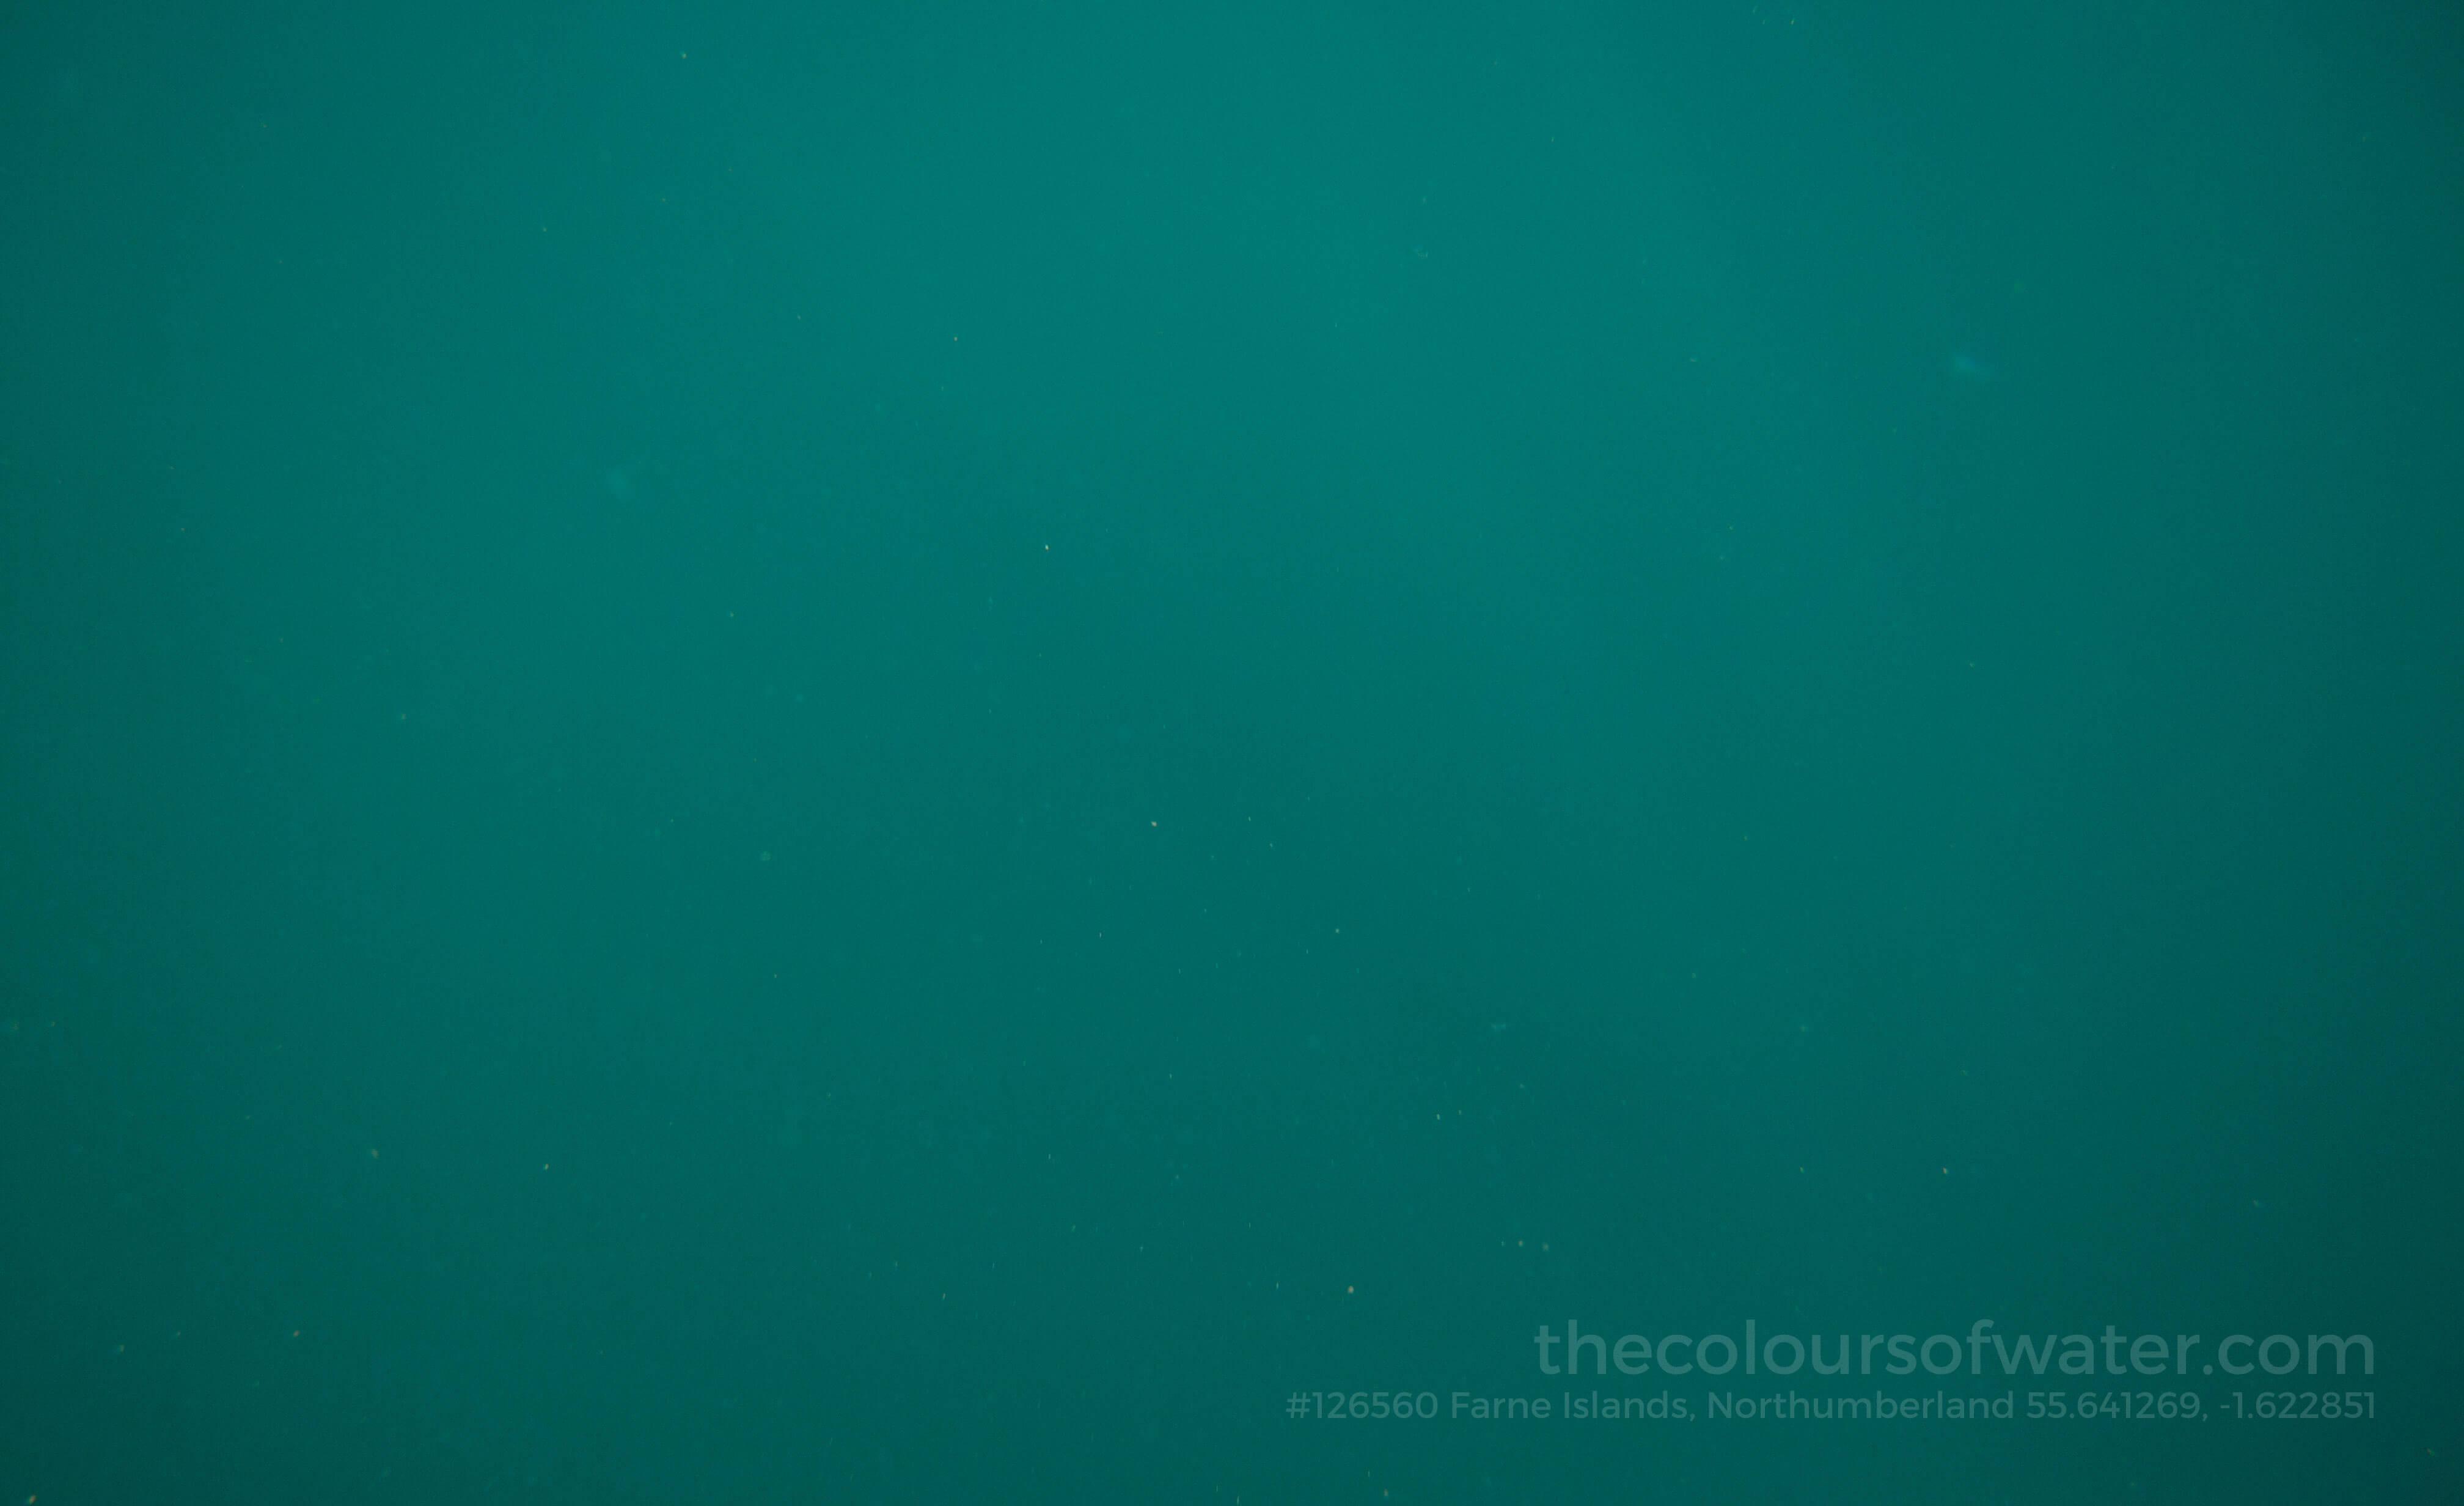 Farne Islands, Northumberland North Sea Water #126560